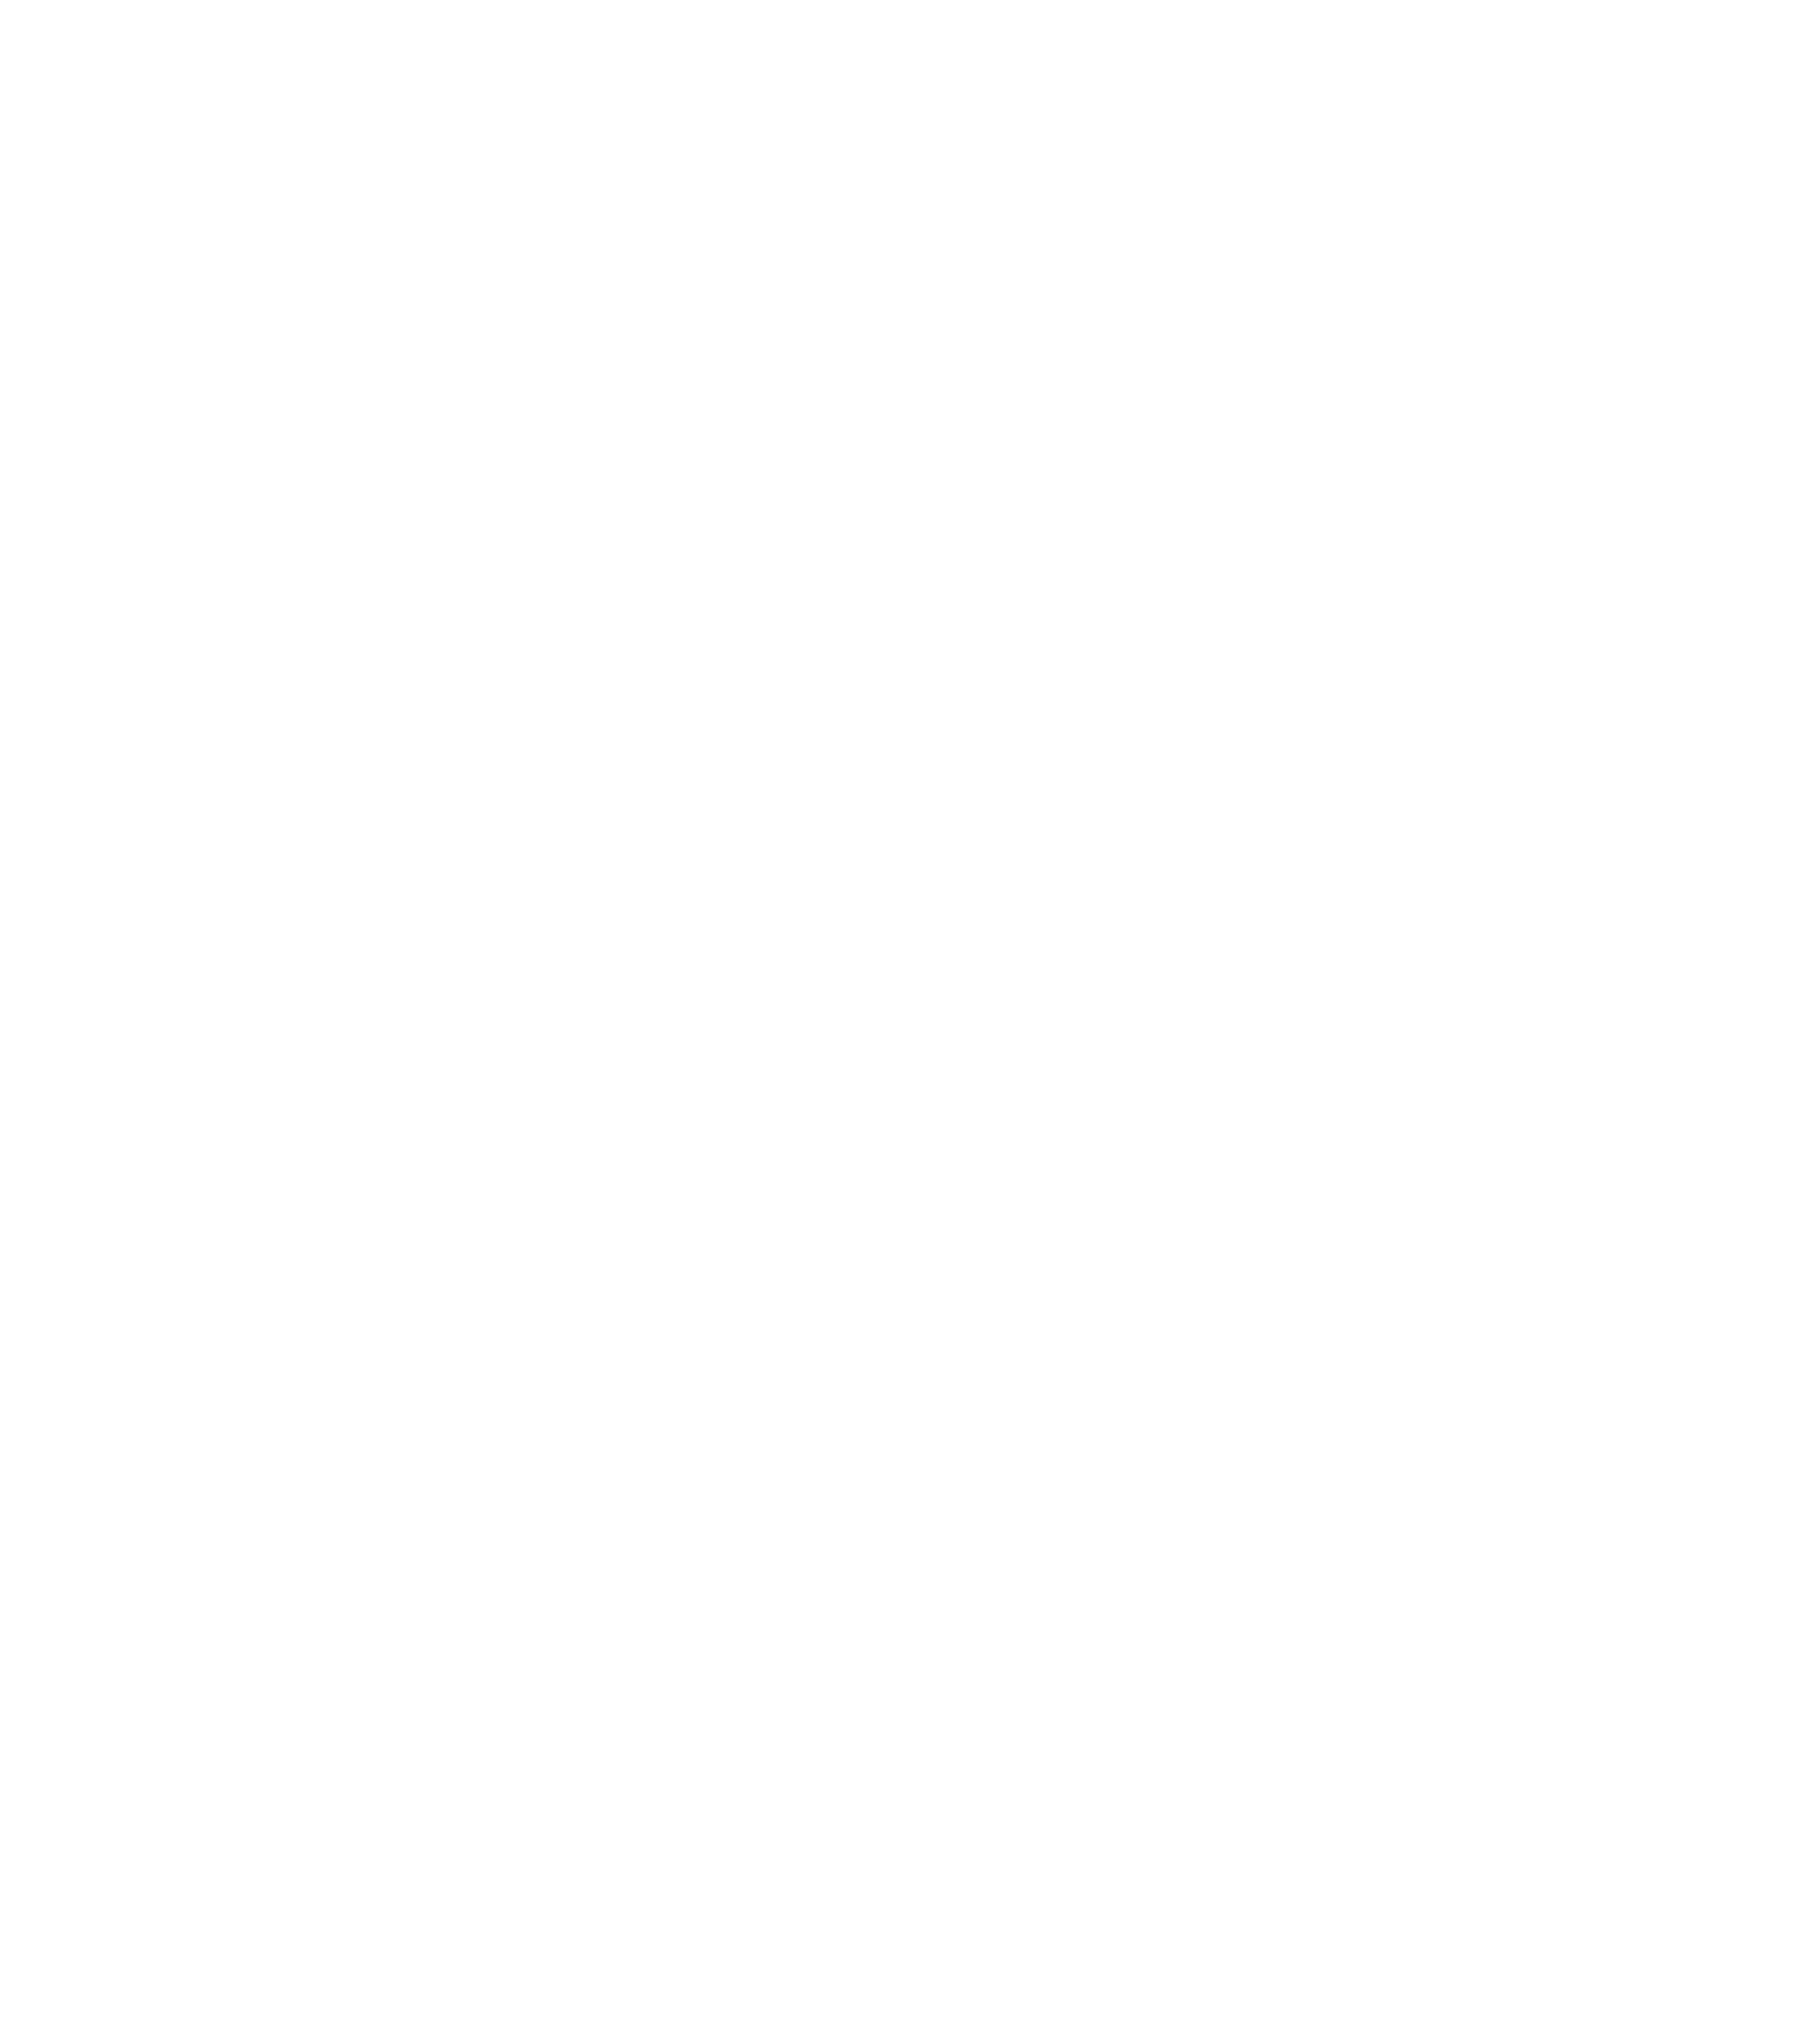 VBX_Kits_IconDesign_DDDA_Merged-24.png